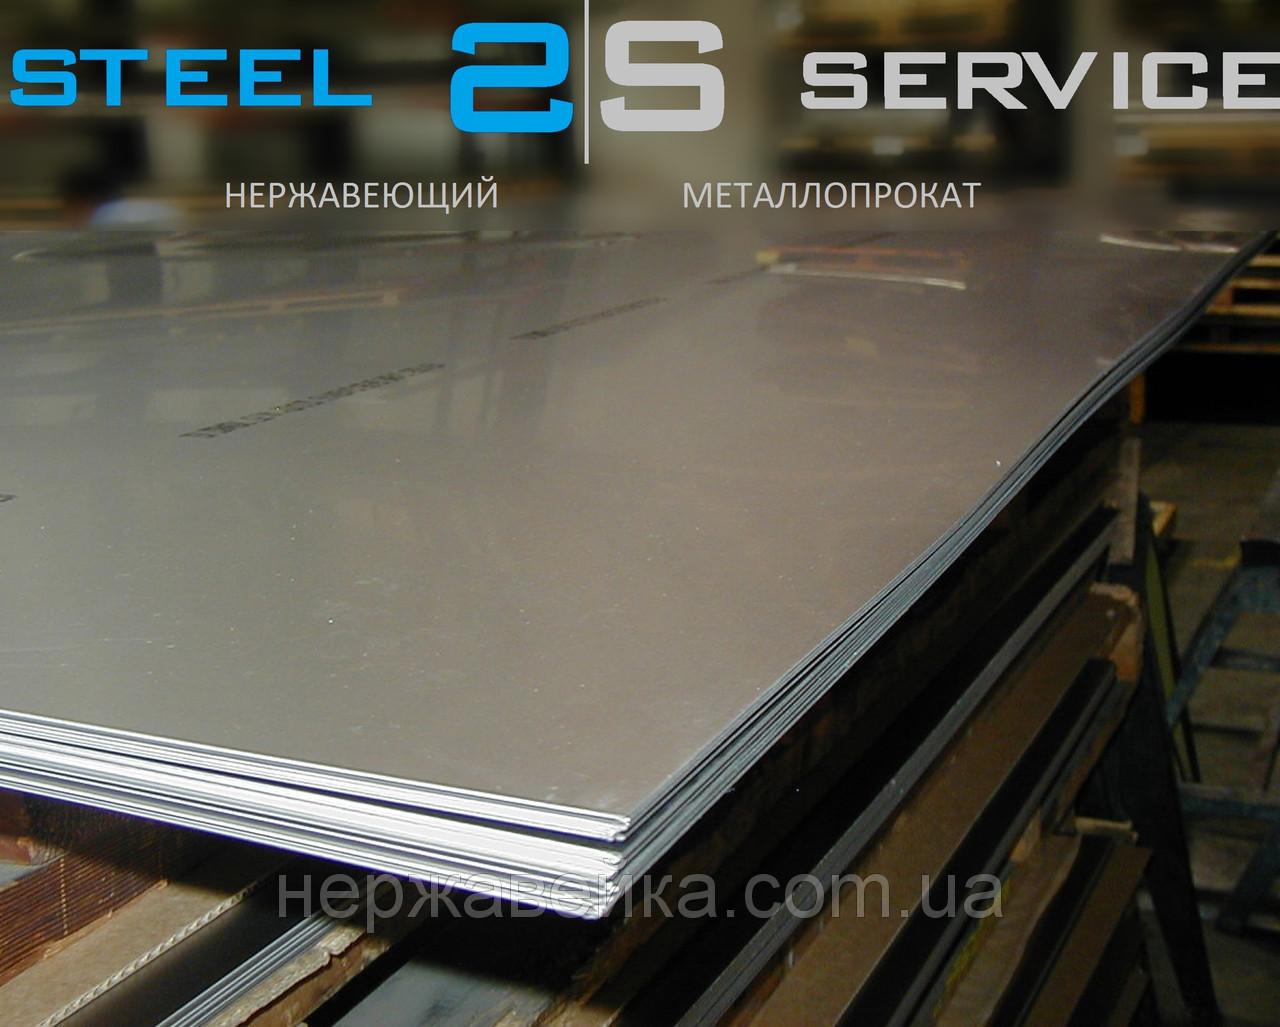 Нержавейка лист 6х1500х6000мм AISI 430(12Х17) 2B - матовый, технический